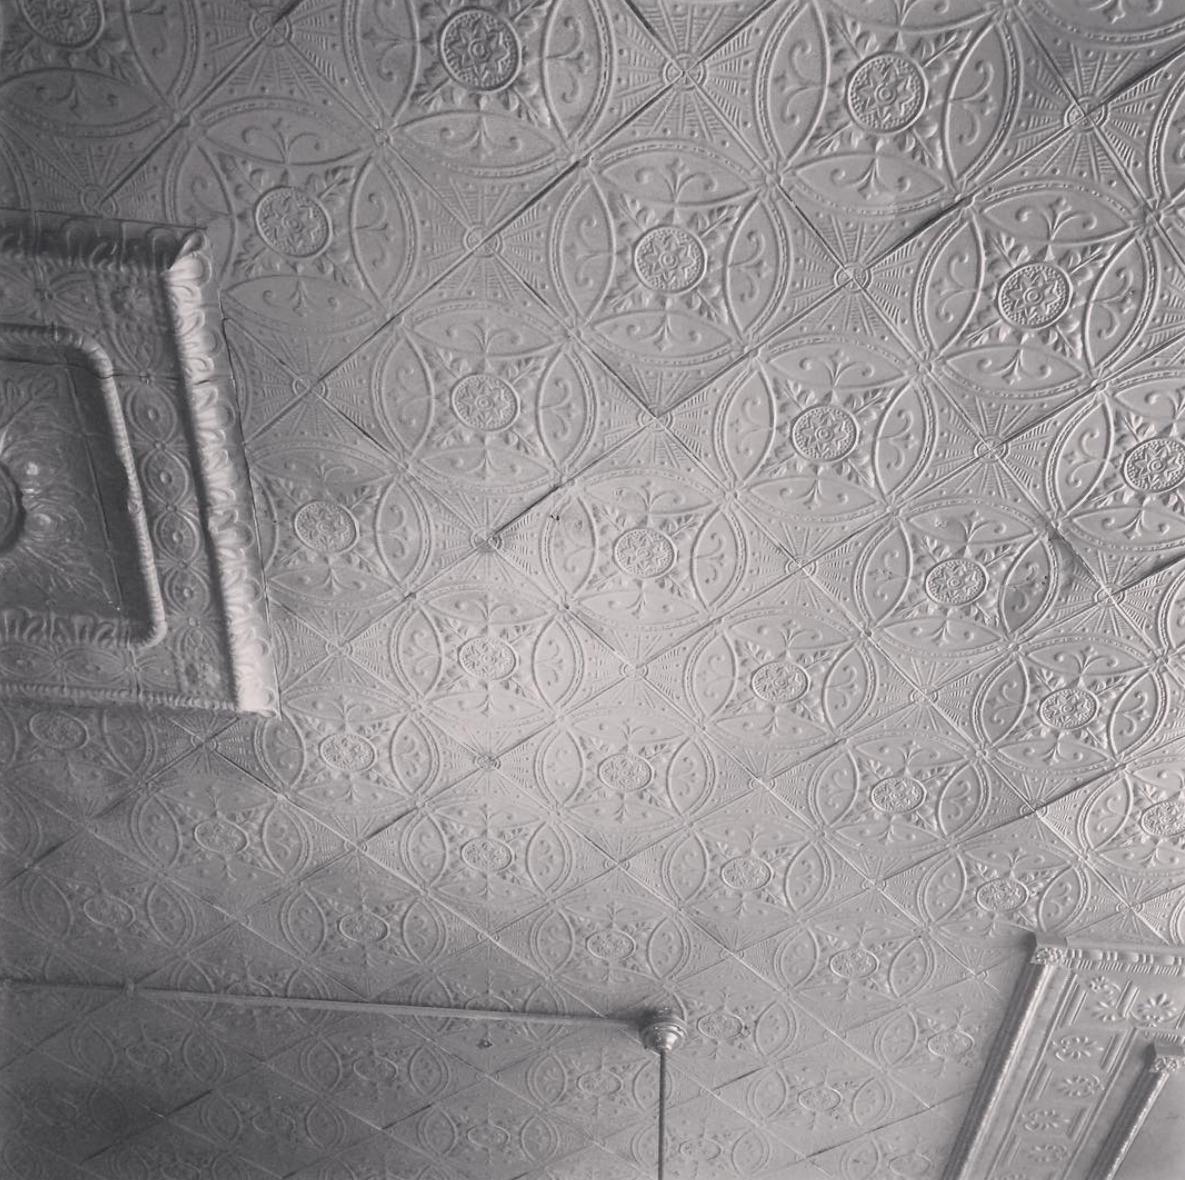 Ceiling built 1910 - architecture - stug | ello